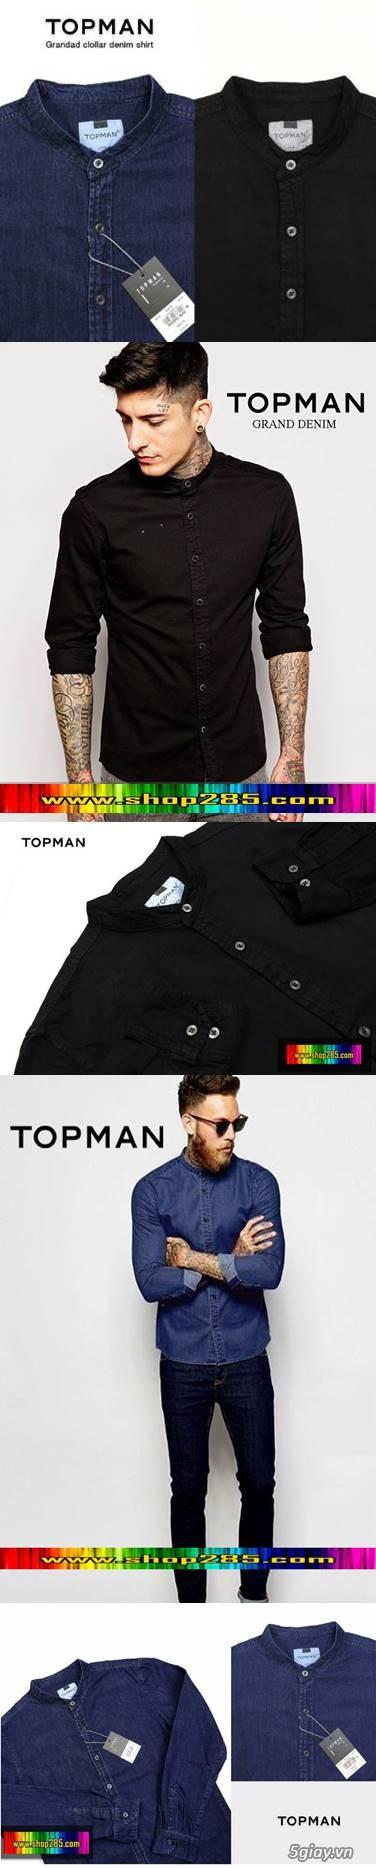 Shop285.com - Shop quần áo : Zara,Jules,Jake*s,,Hollister,Aber,CK,Tommy,Levis - 48